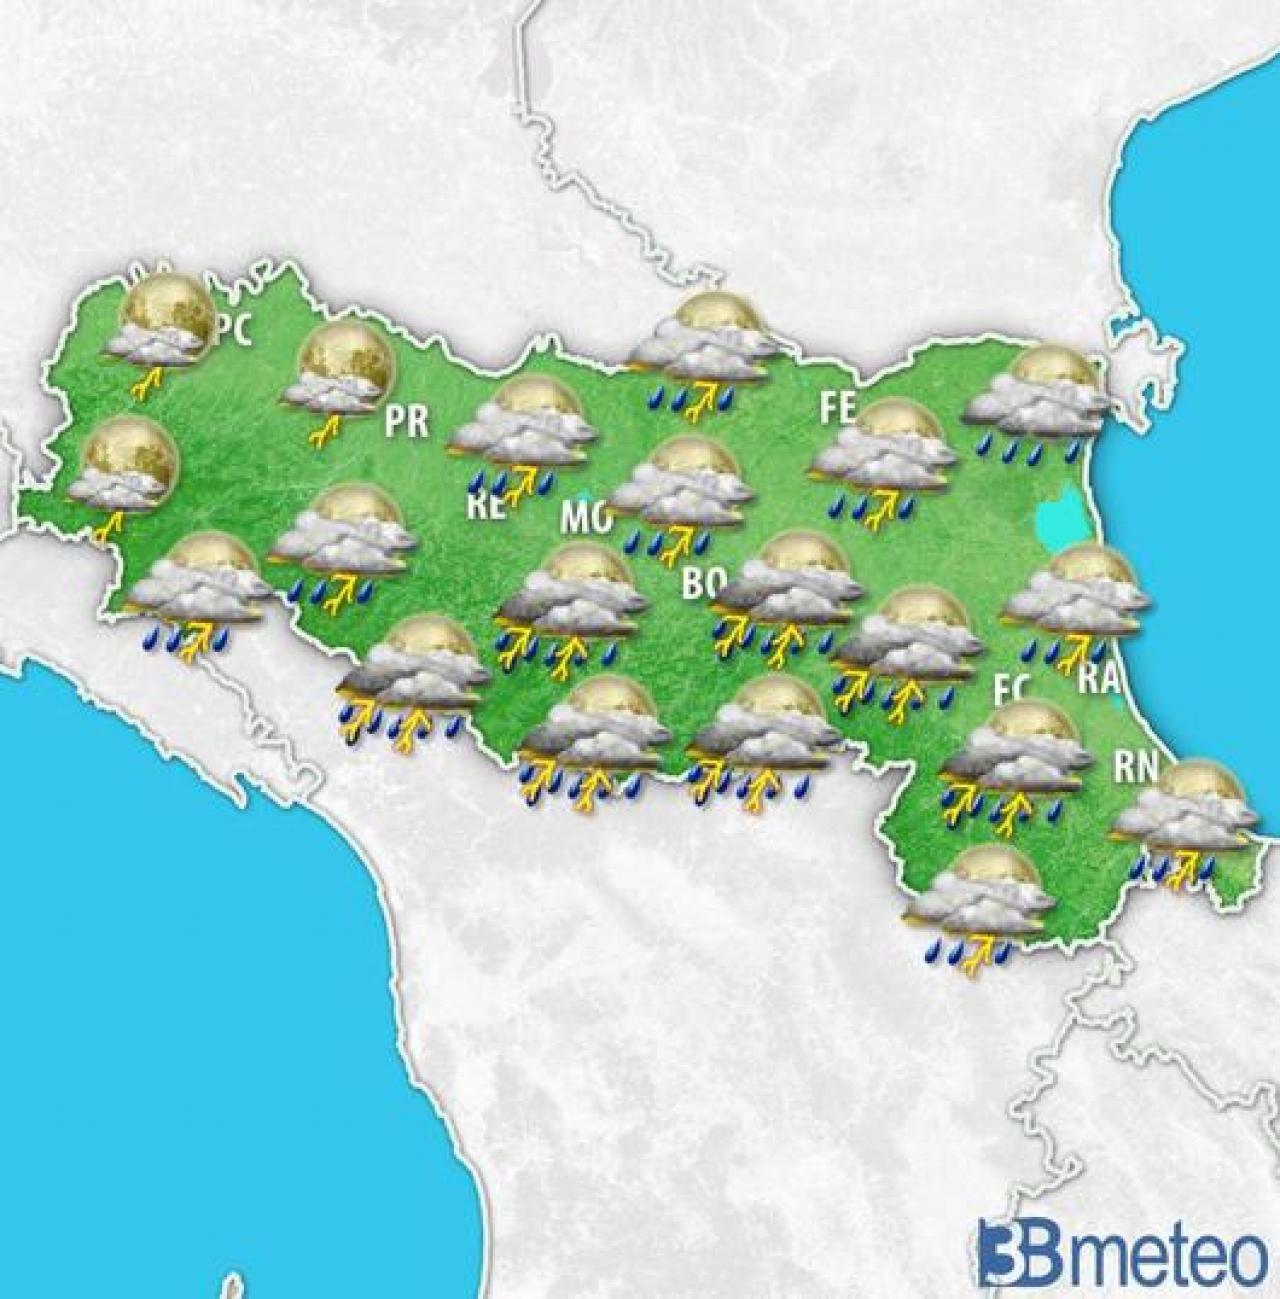 Meteo emilia romagna sabato temporalesco pasqua con pi sole 3b meteo - 3b meteo bagno di romagna ...